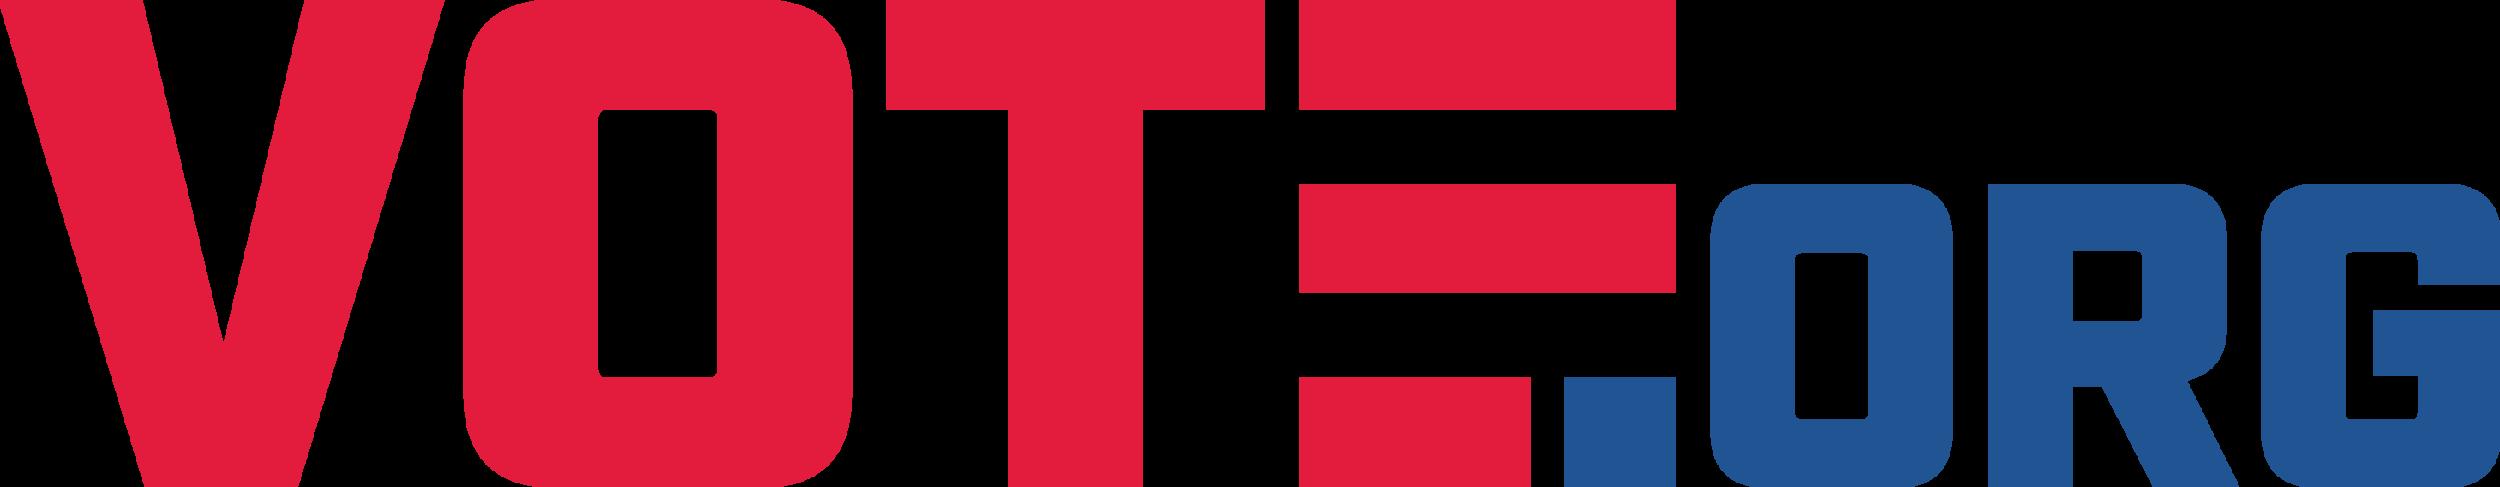 vote.org_logo.png